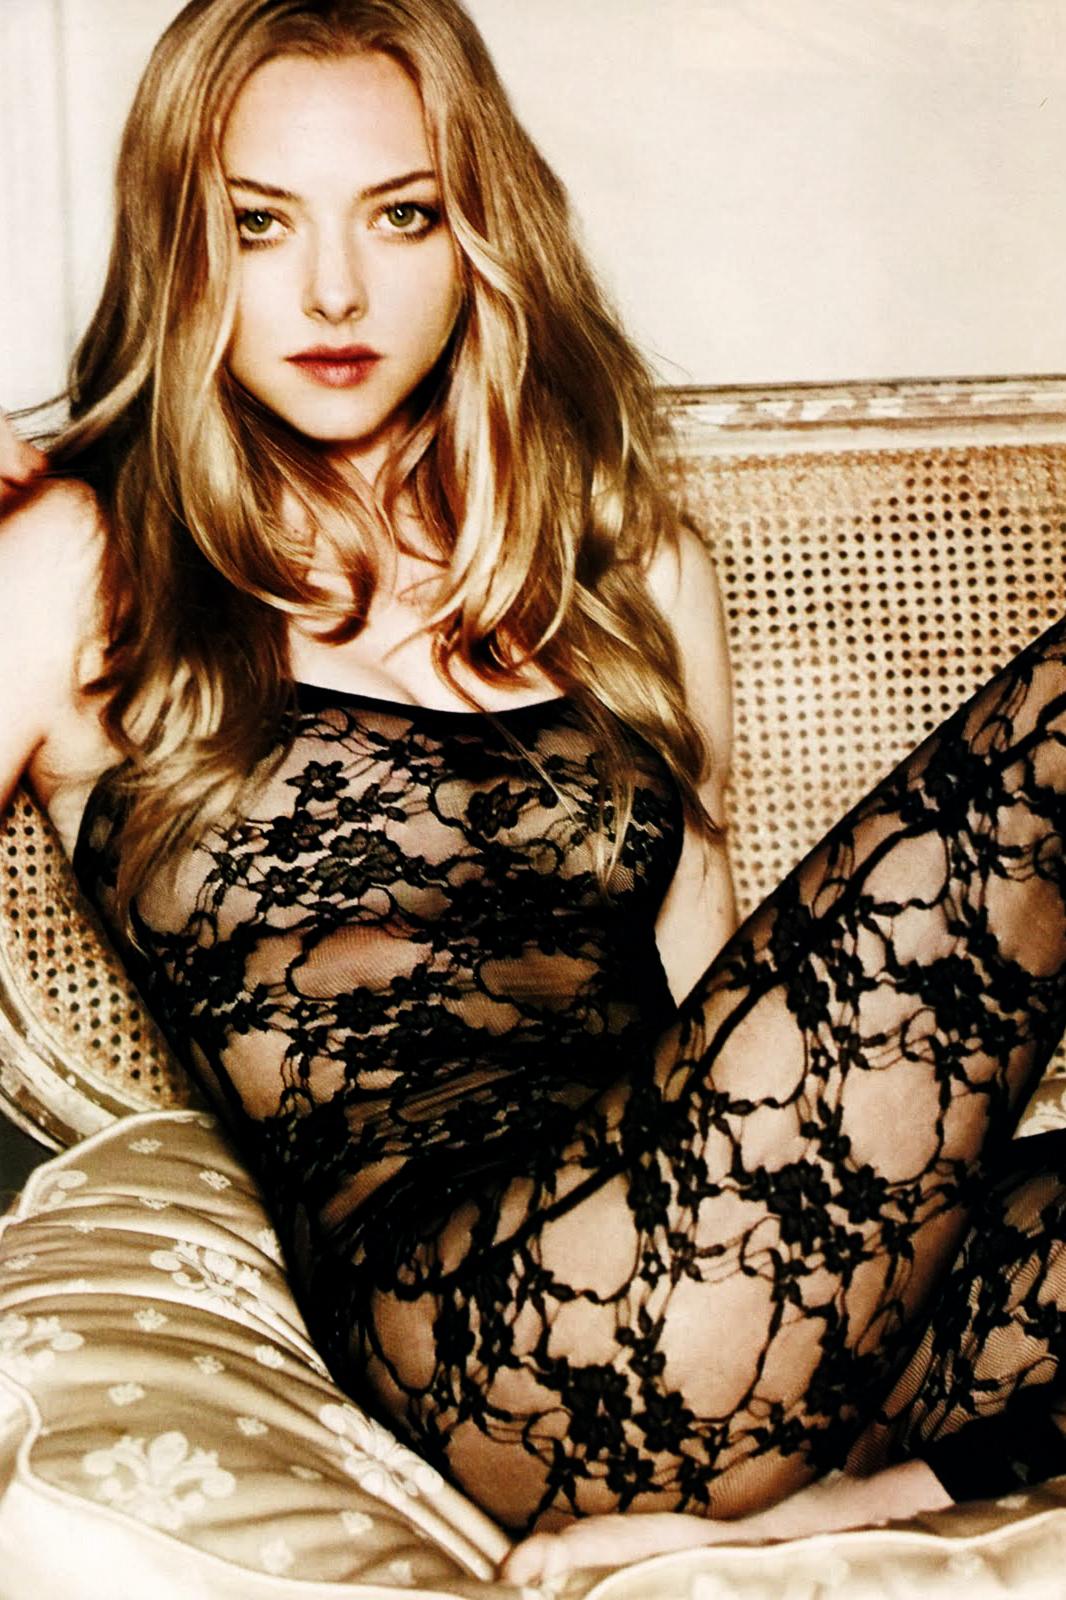 Amanda Seyfried Hot Pictures | Amanda Seyfried Wallpapers